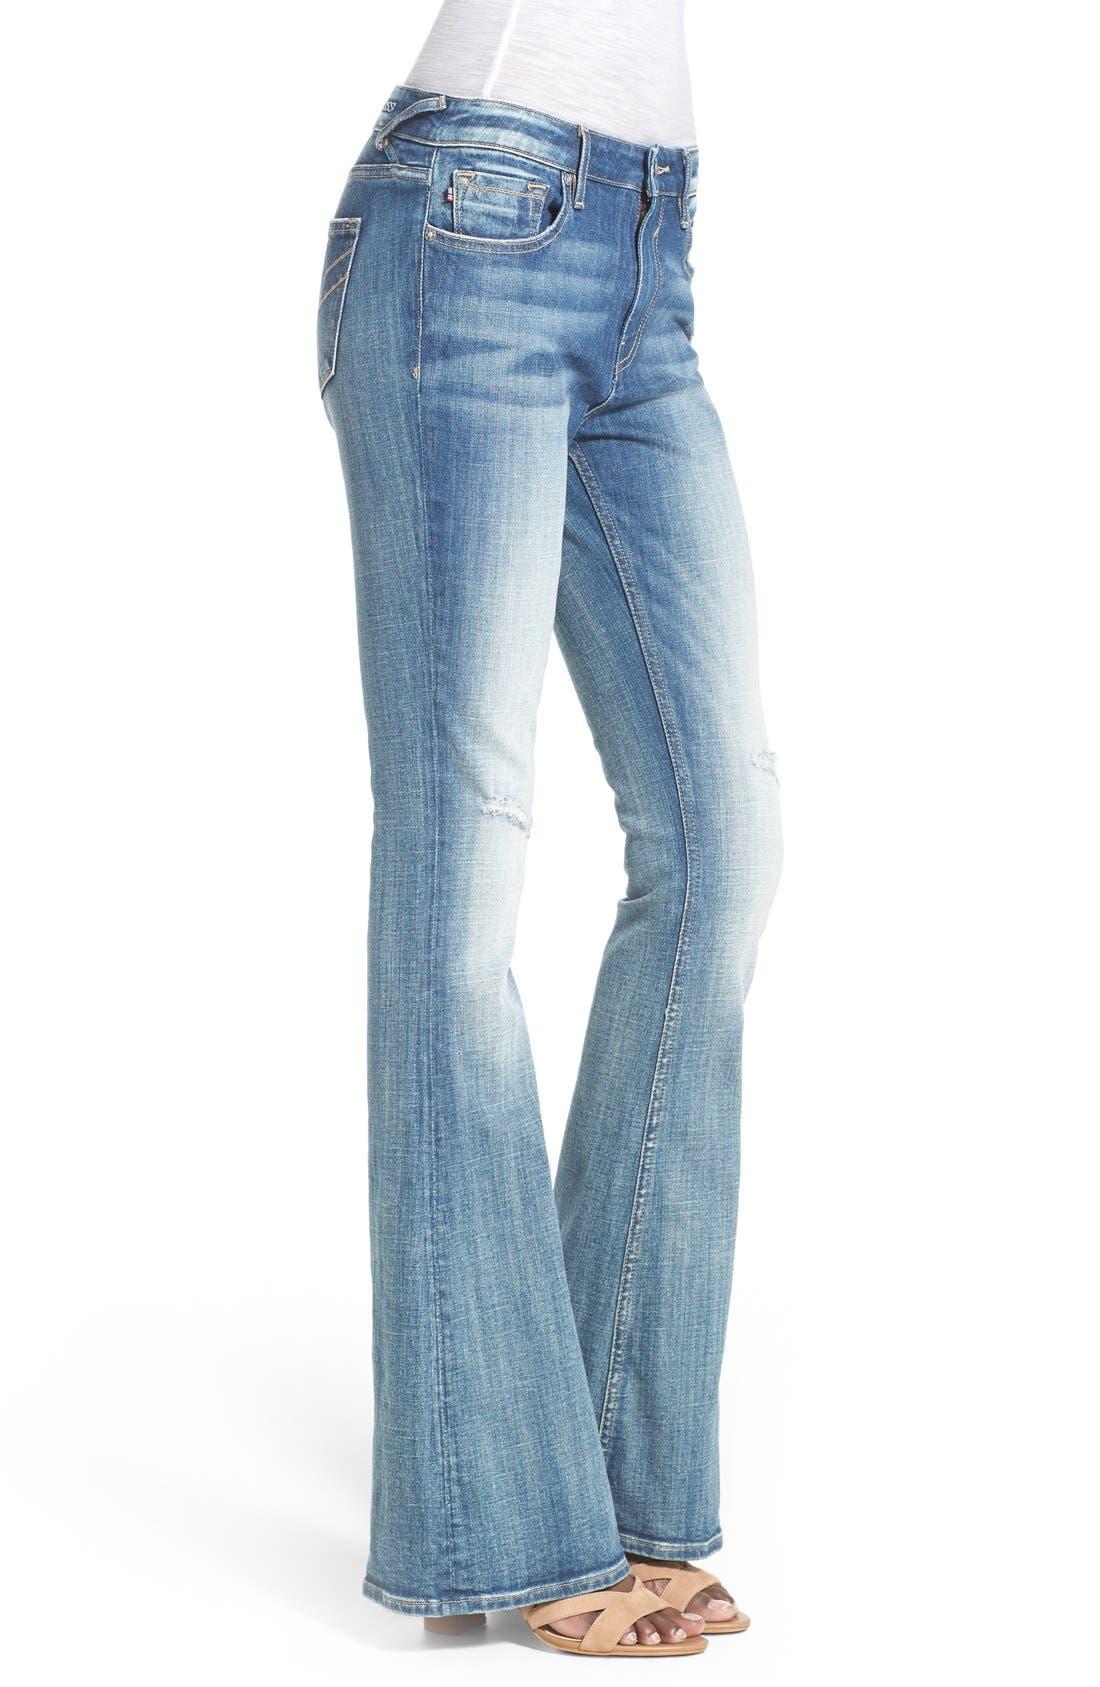 Alternate Image 3  - Vigoss 'Chelsea' Flare Jeans (Medium Wash)